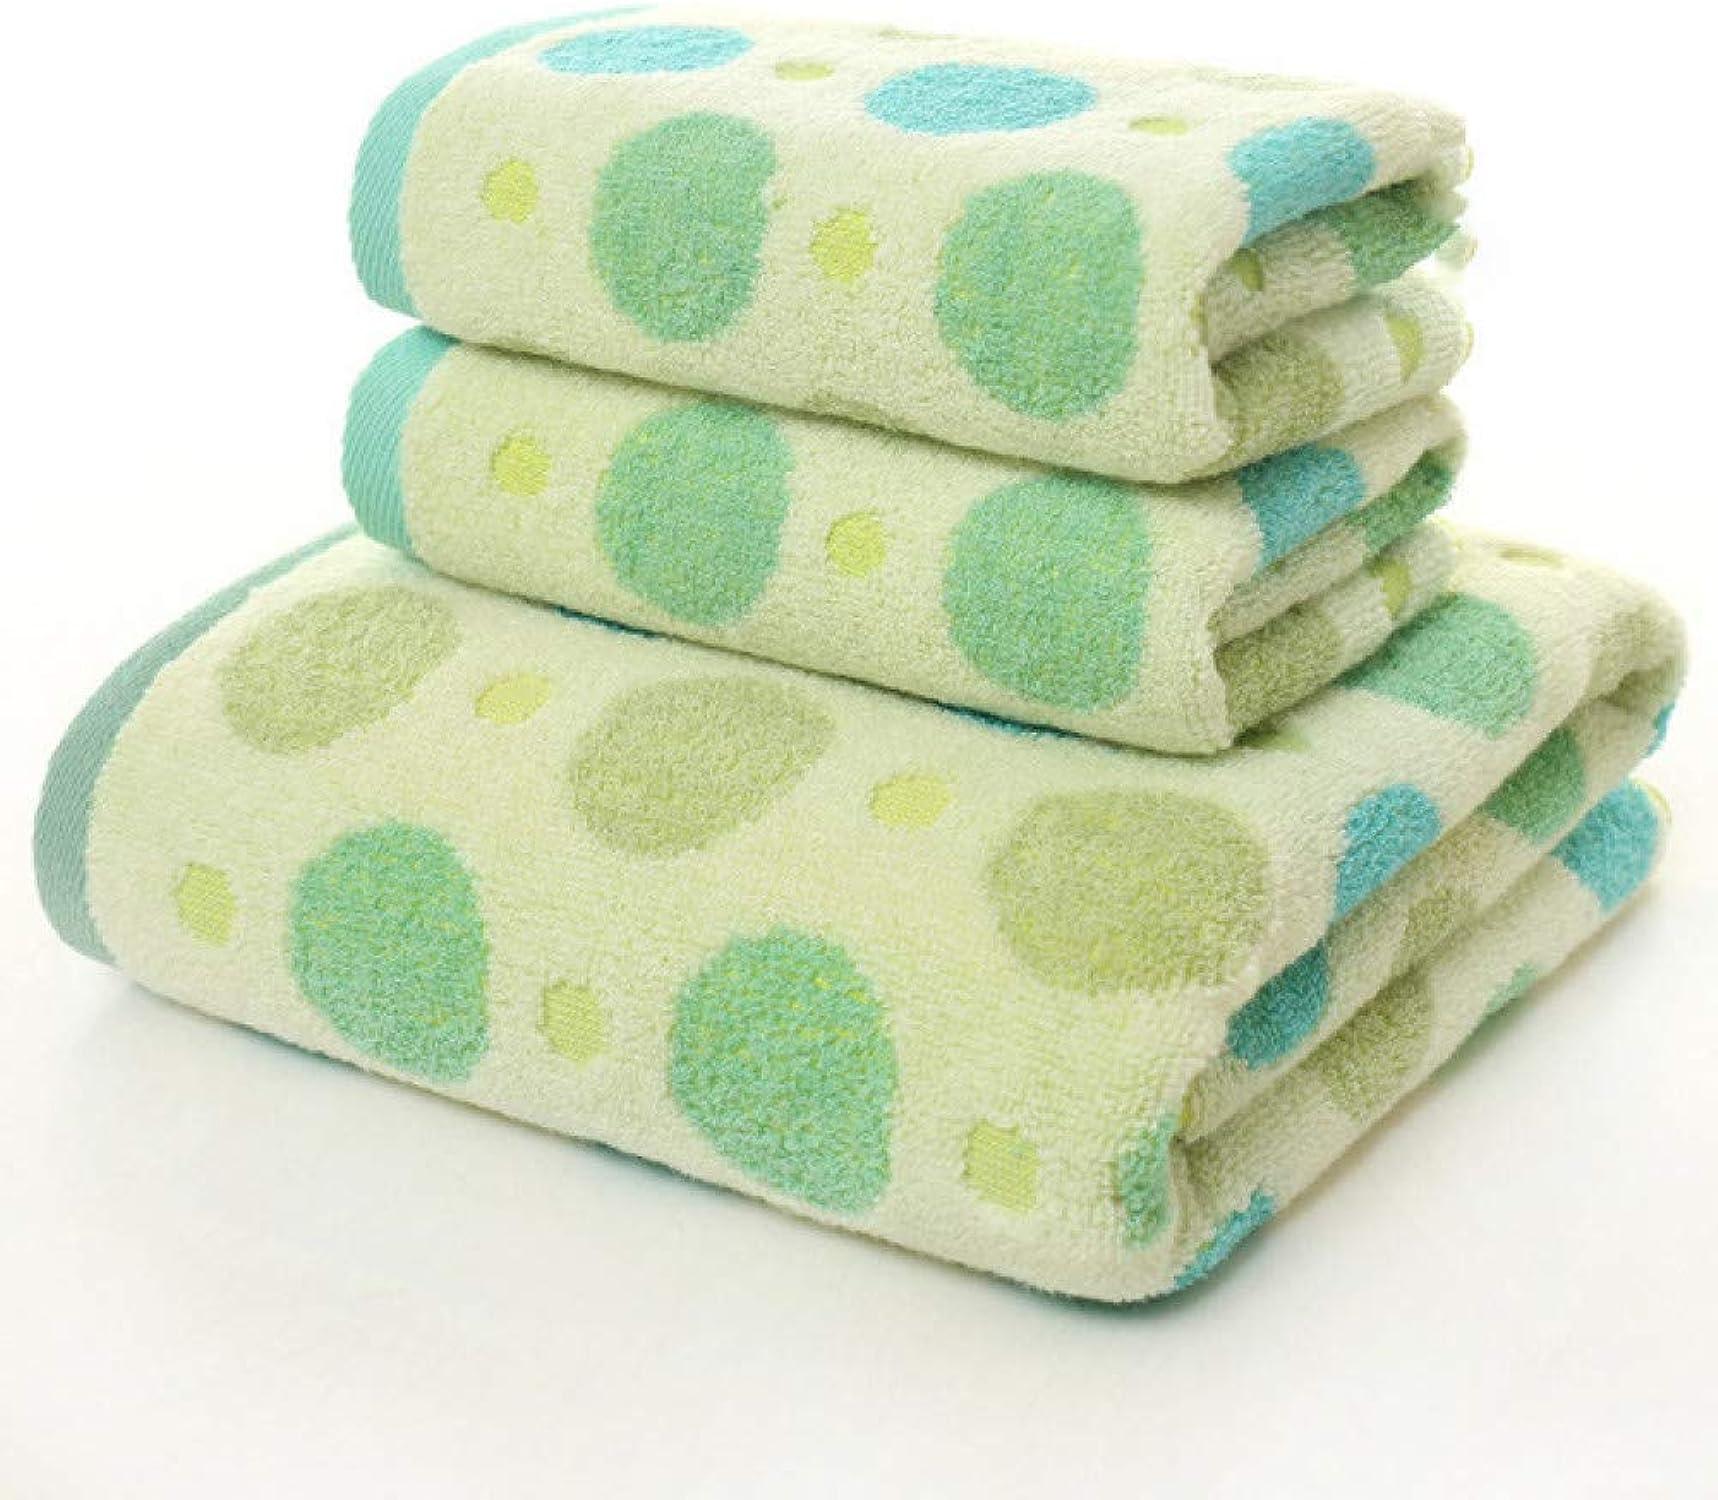 Gris Zapatilla baja para mujer 12824_gycl Skechers Textil